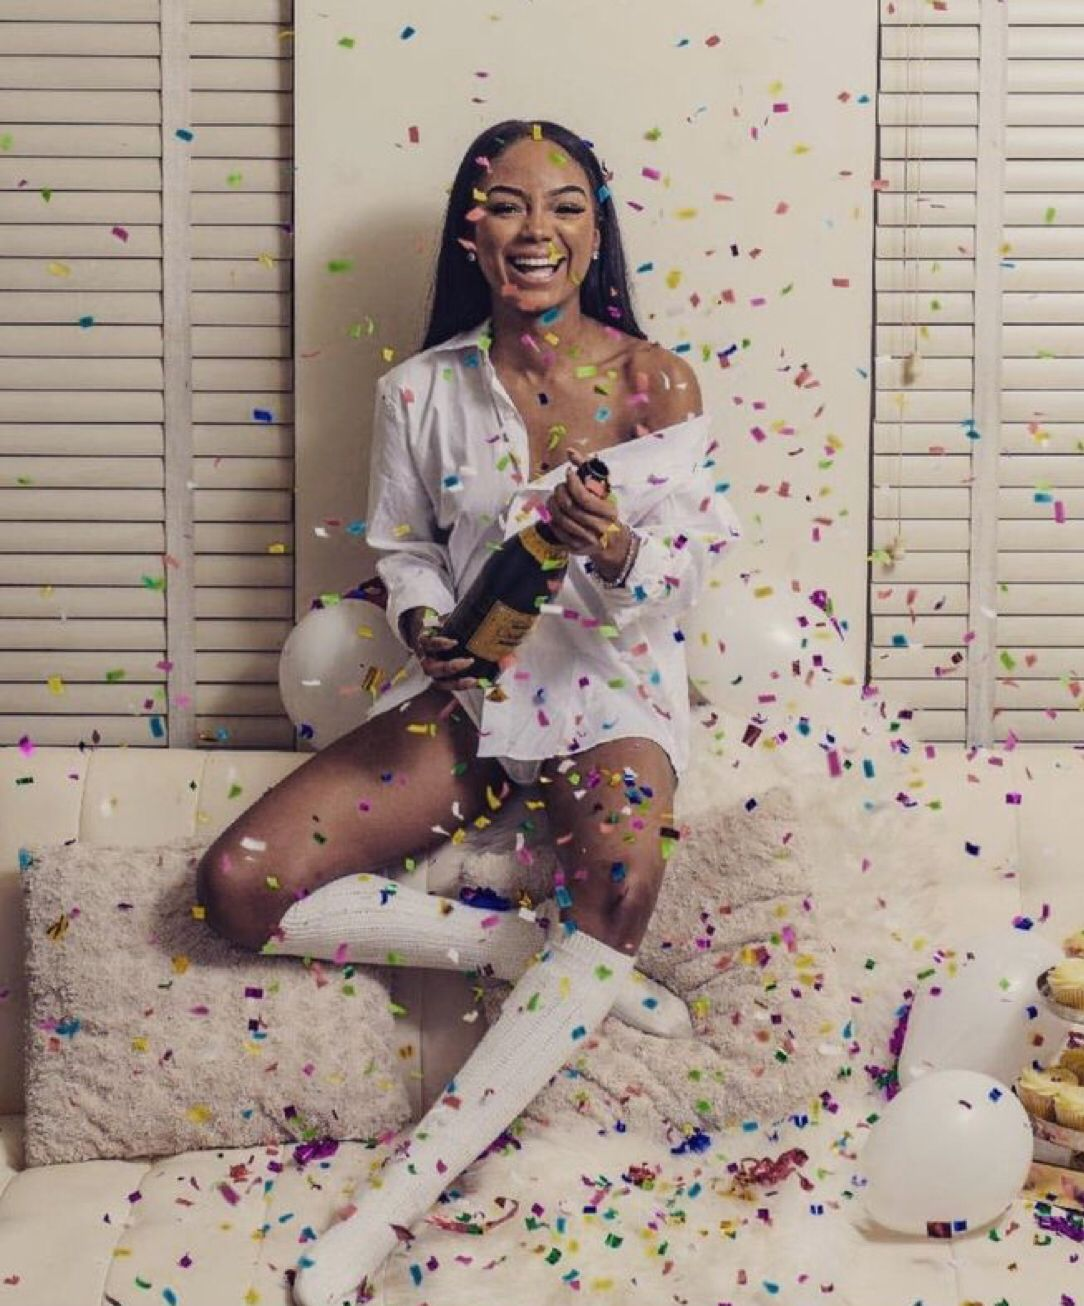 pin ' kjvougee 💜 21st birthday photoshoot, Birthday